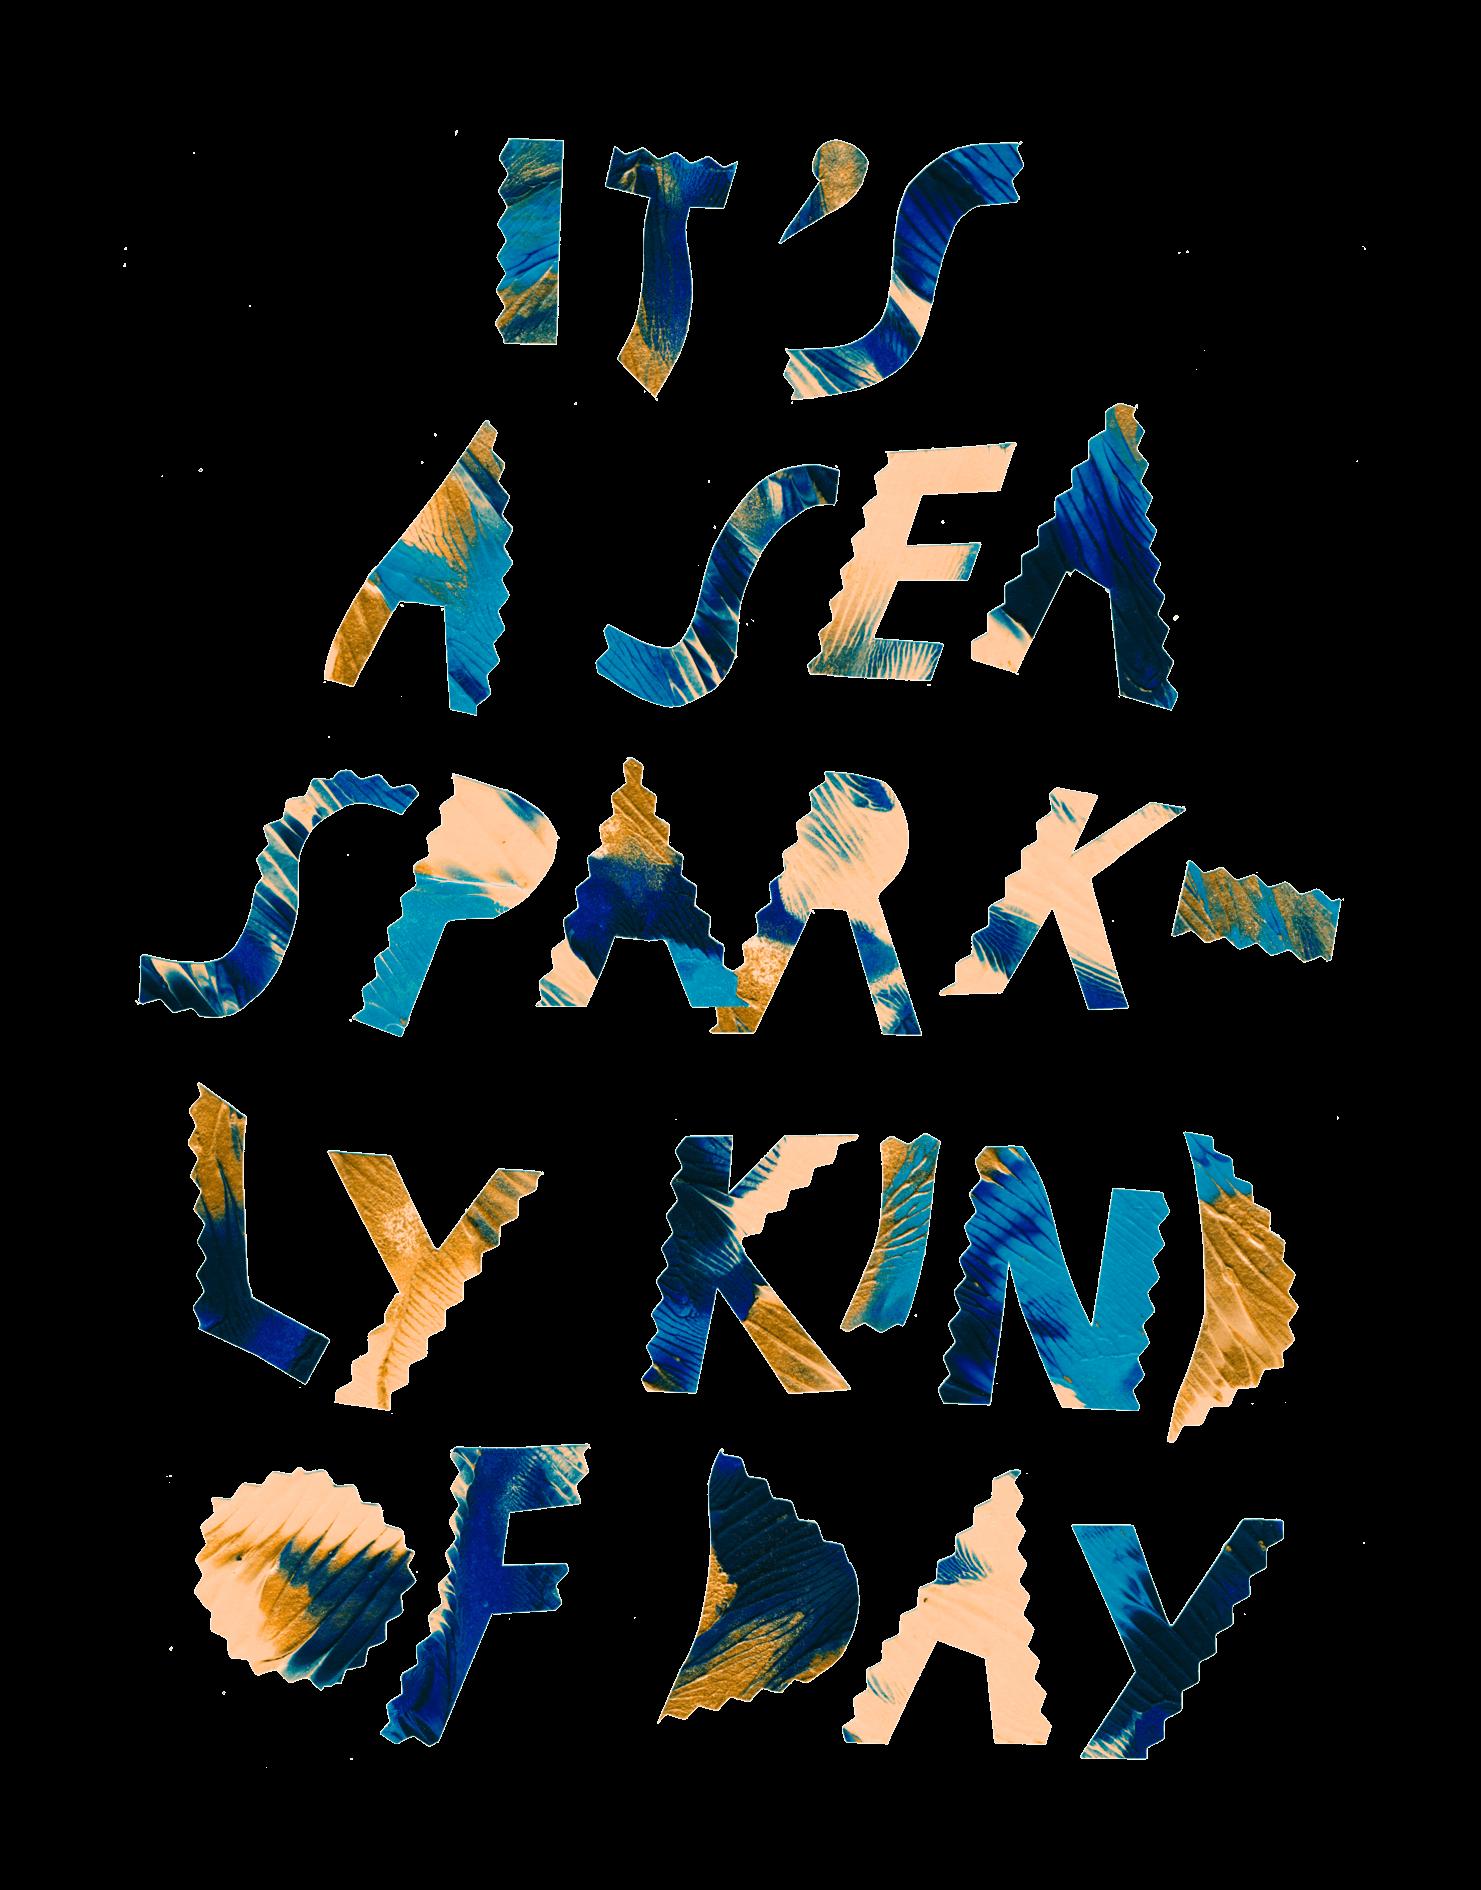 ItsASeaSparklyKindOfDay